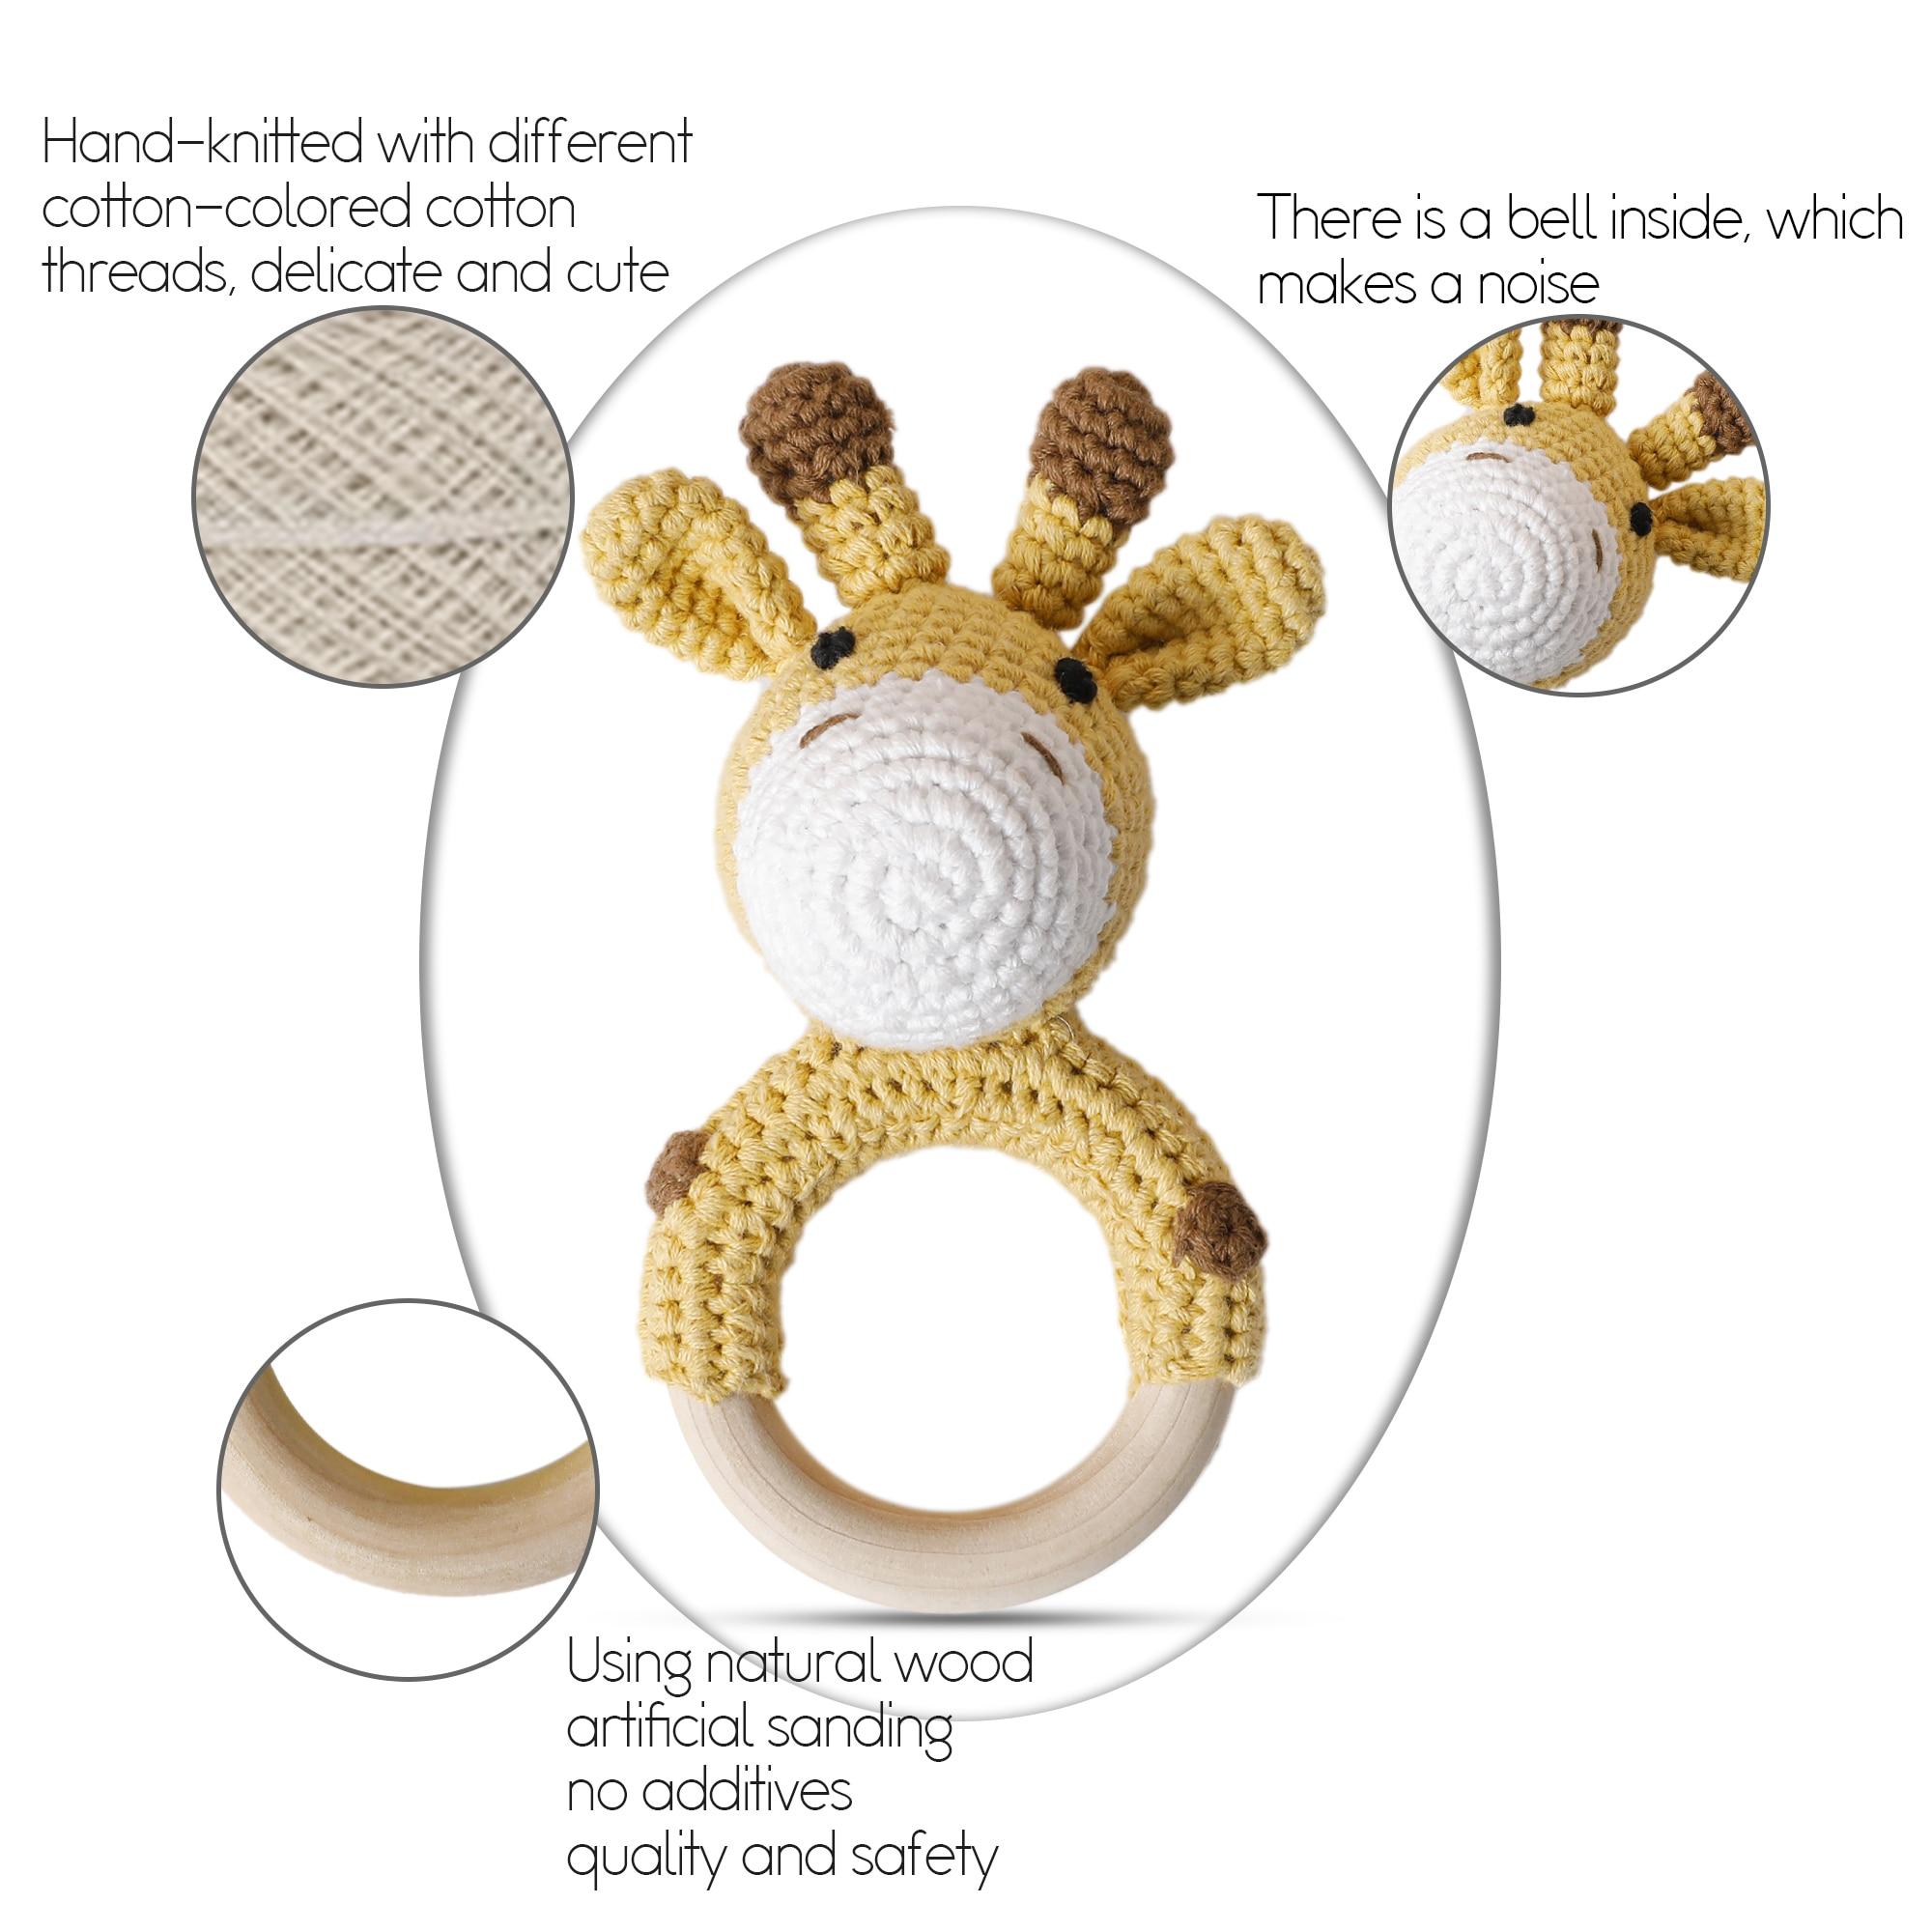 Bopoobo 1pc bebi zube za zube sigurne drvene igračke mobilni dječji - Igračke za bebe i malu djecu - Foto 3